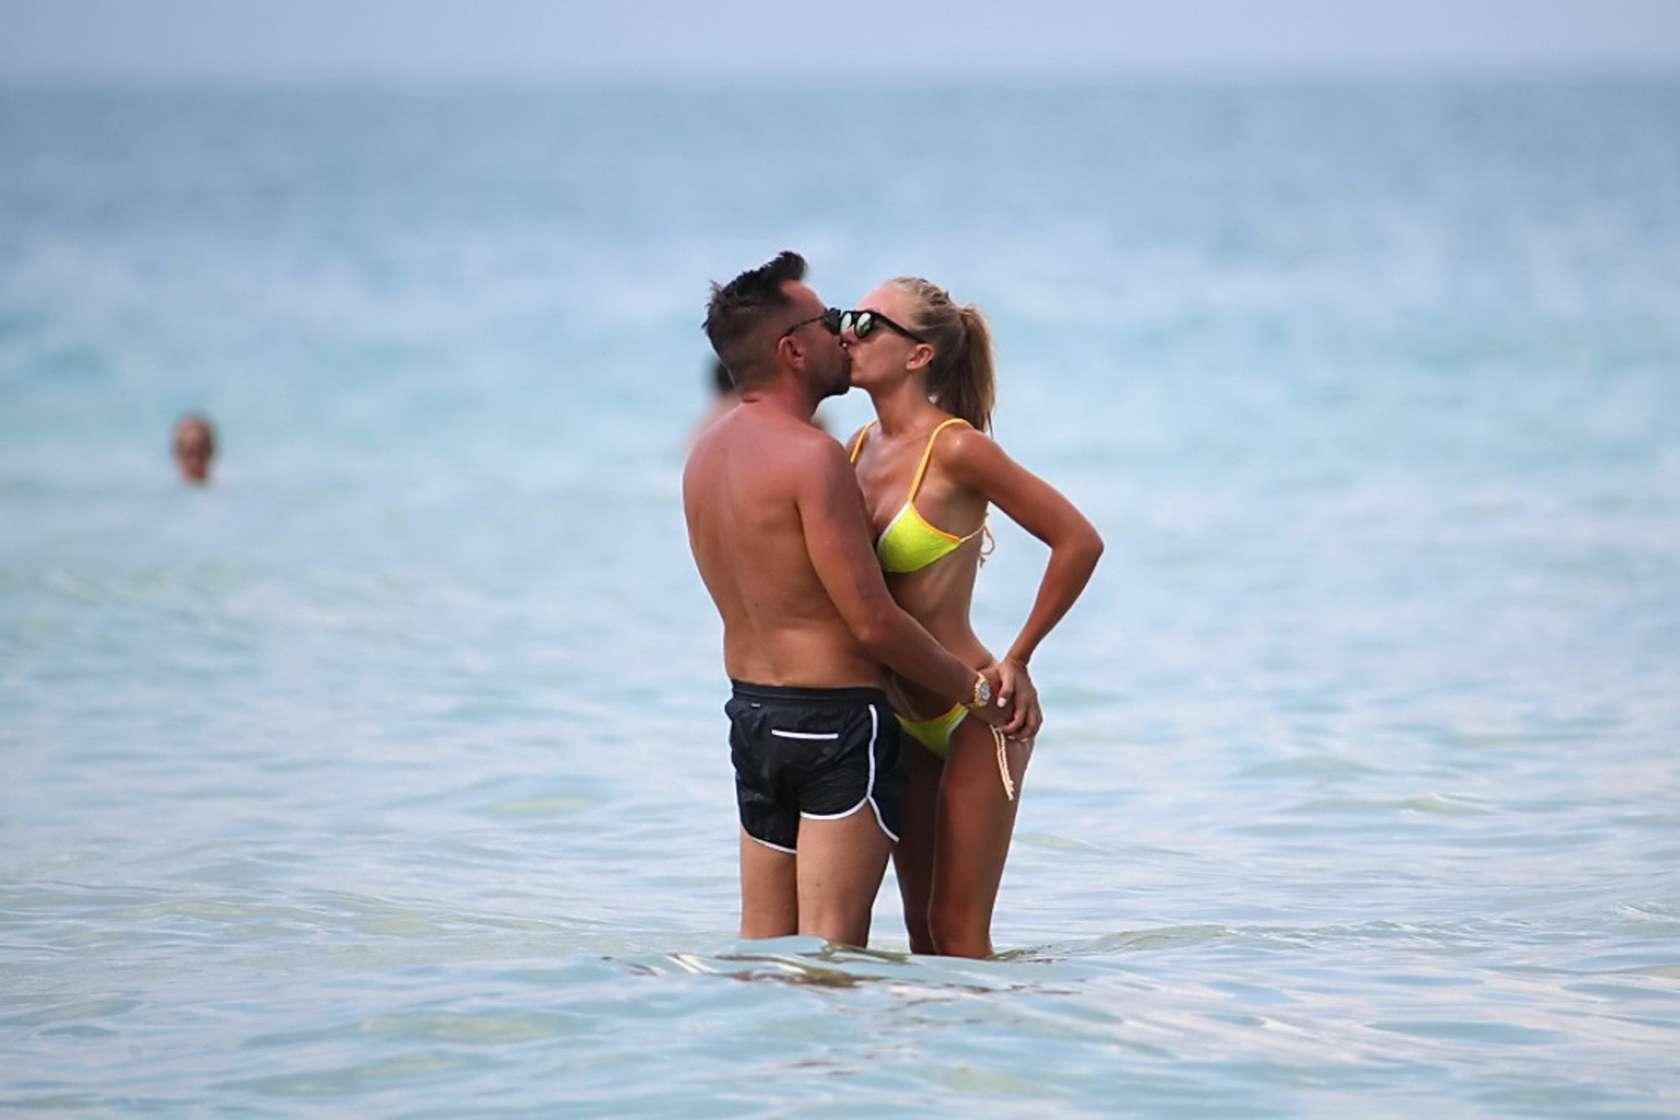 Laura Cremaschi 2016 : Laura Cremaschi: Hot In a bikini in Miami-13